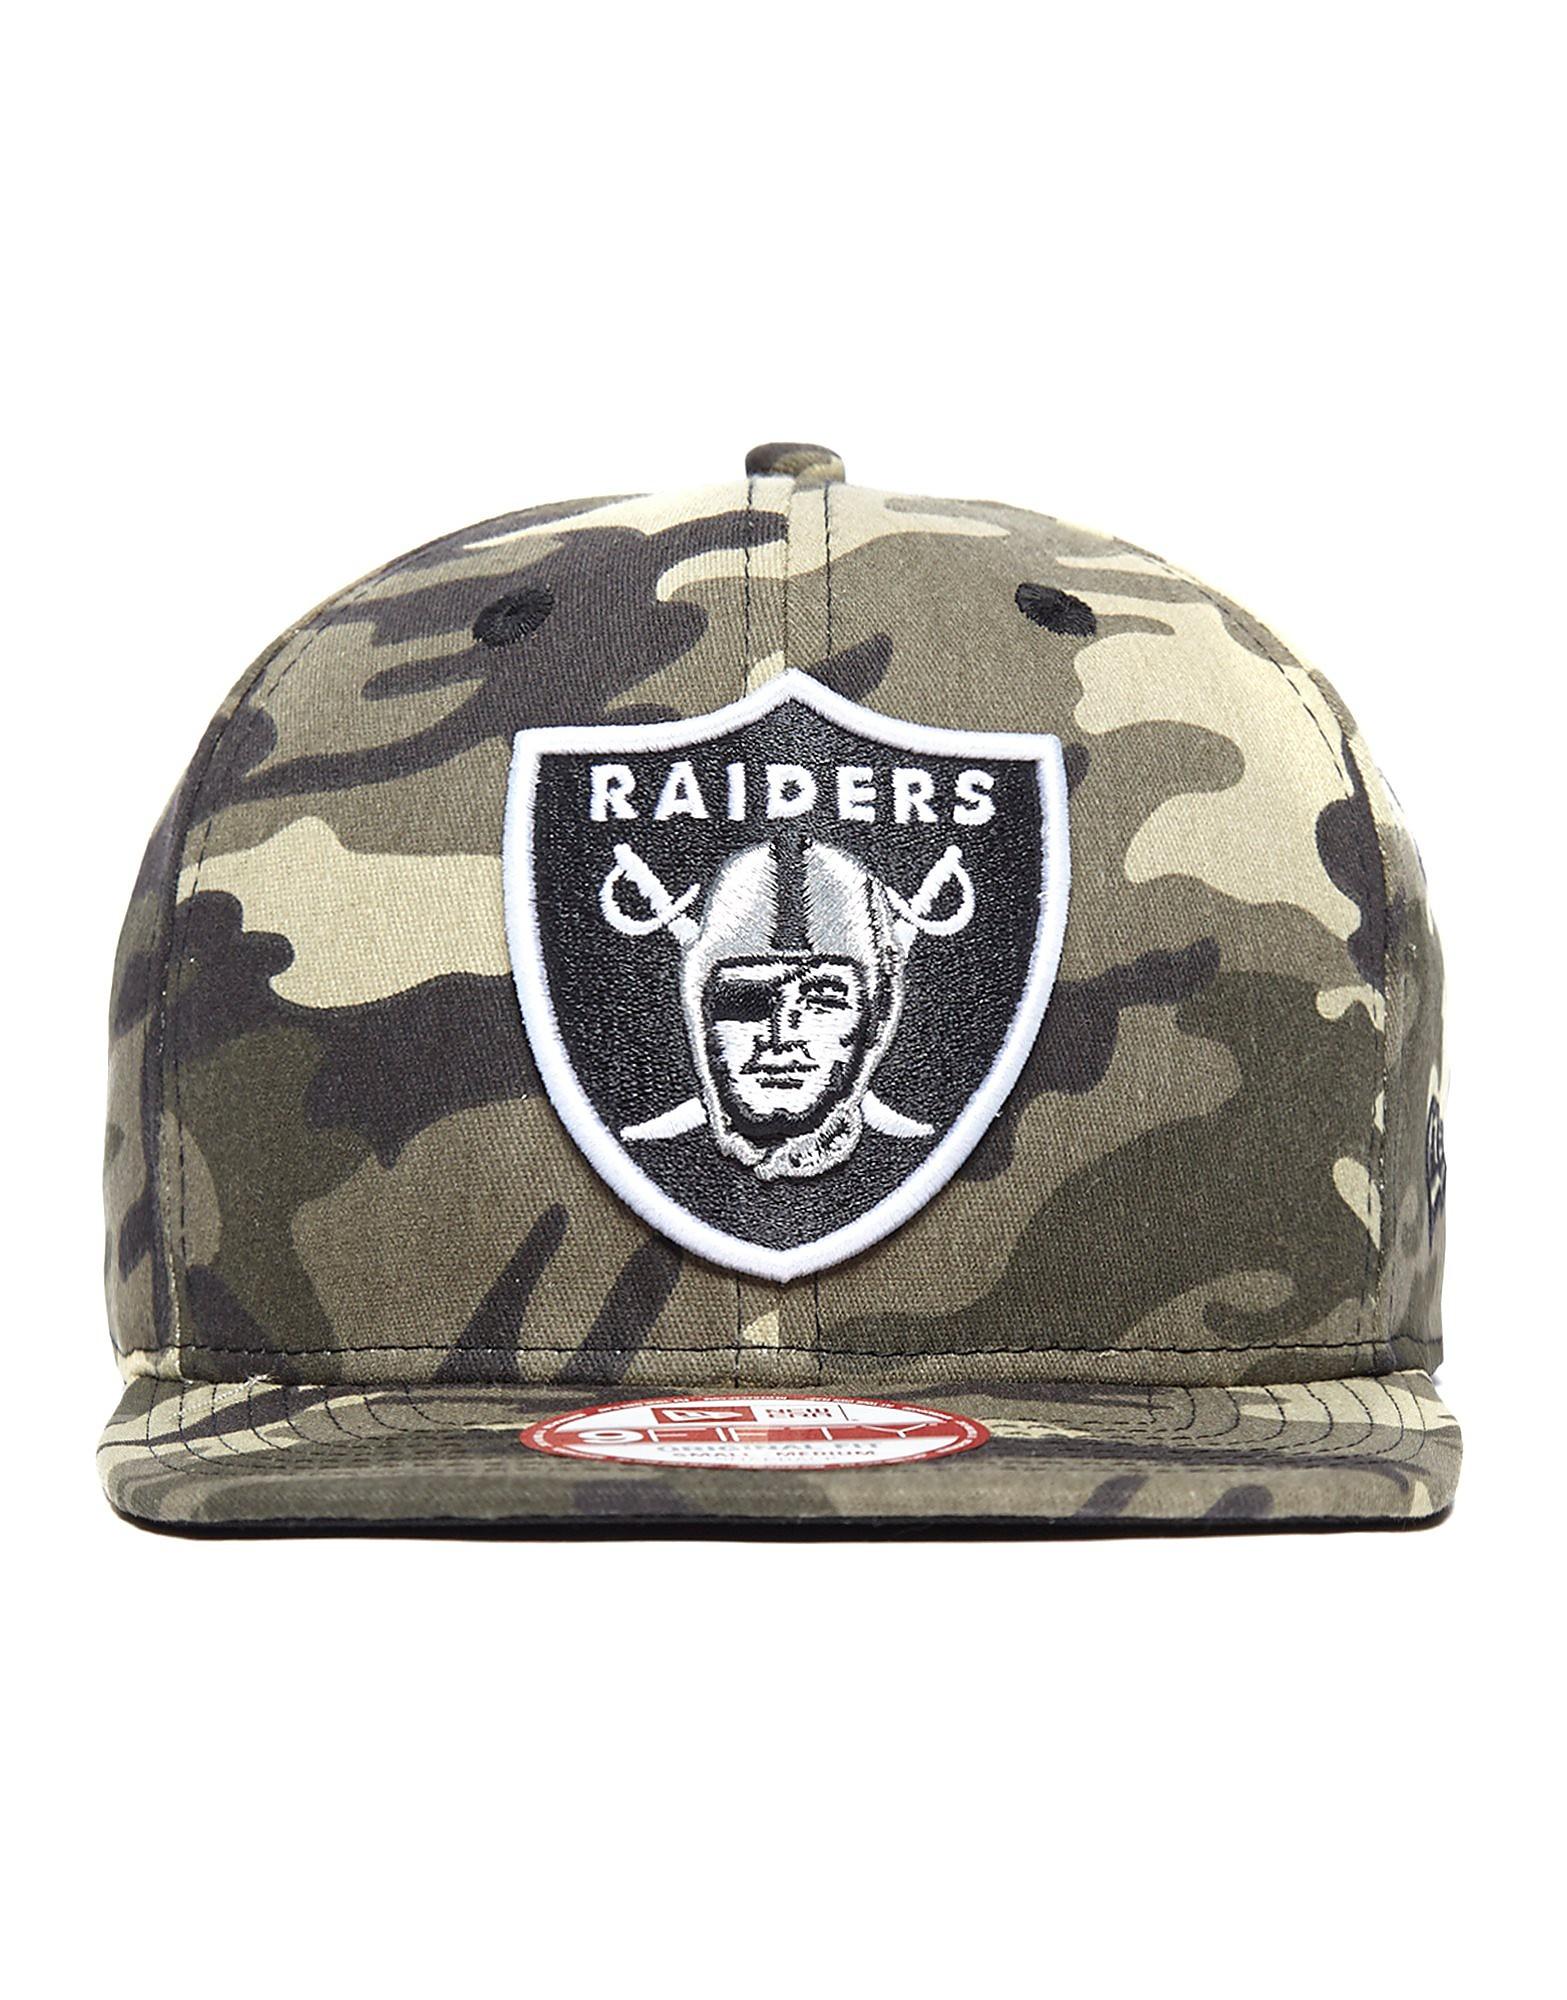 New Era 9FIFTY NFL Oakland Raiders Snapback Cap